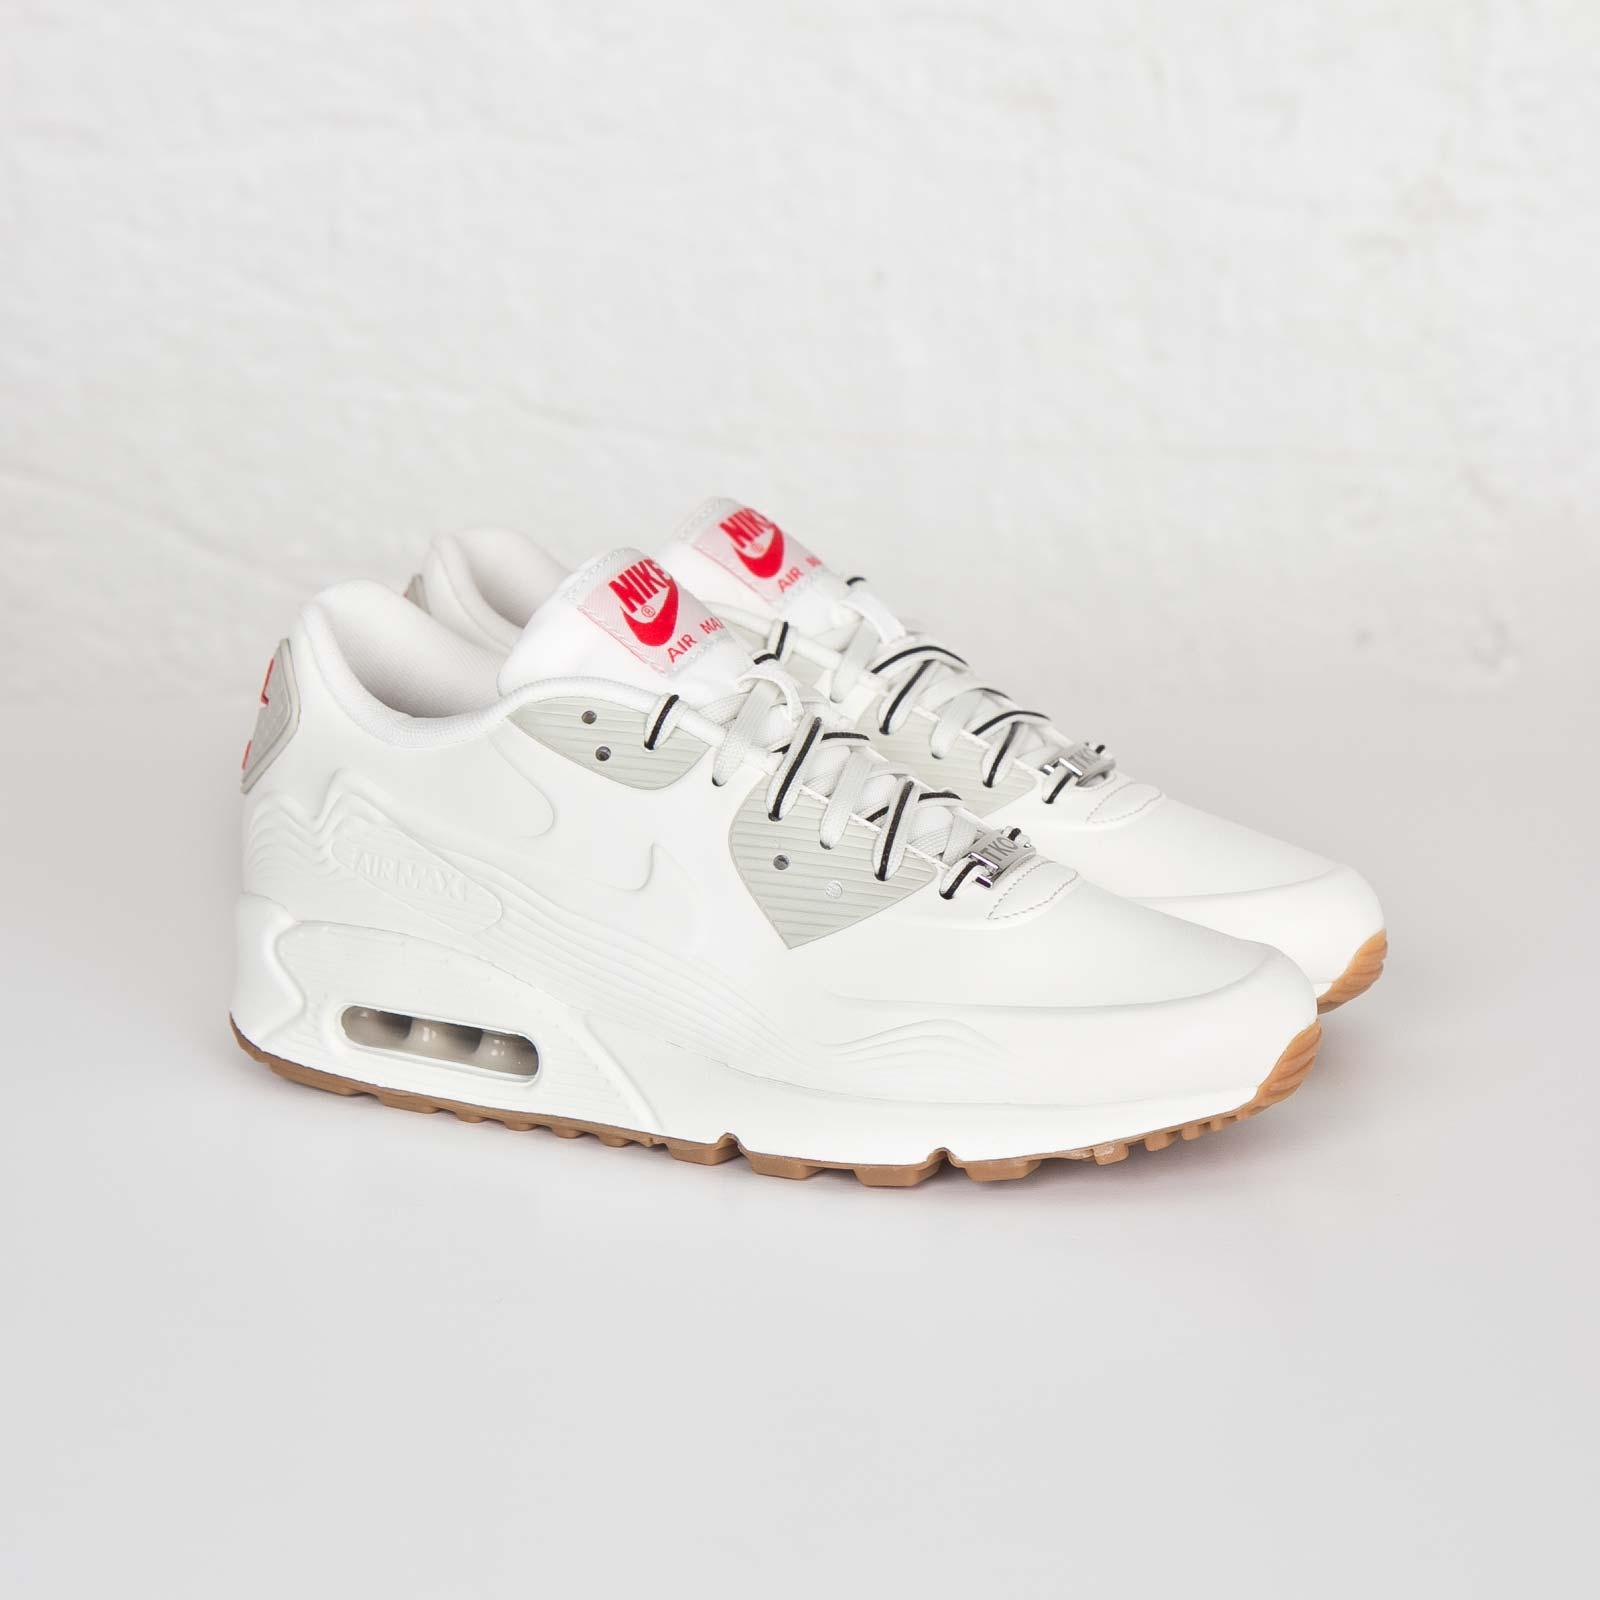 cheaper f3a46 d8a06 Nike Wmns Air Max 90 VT QS